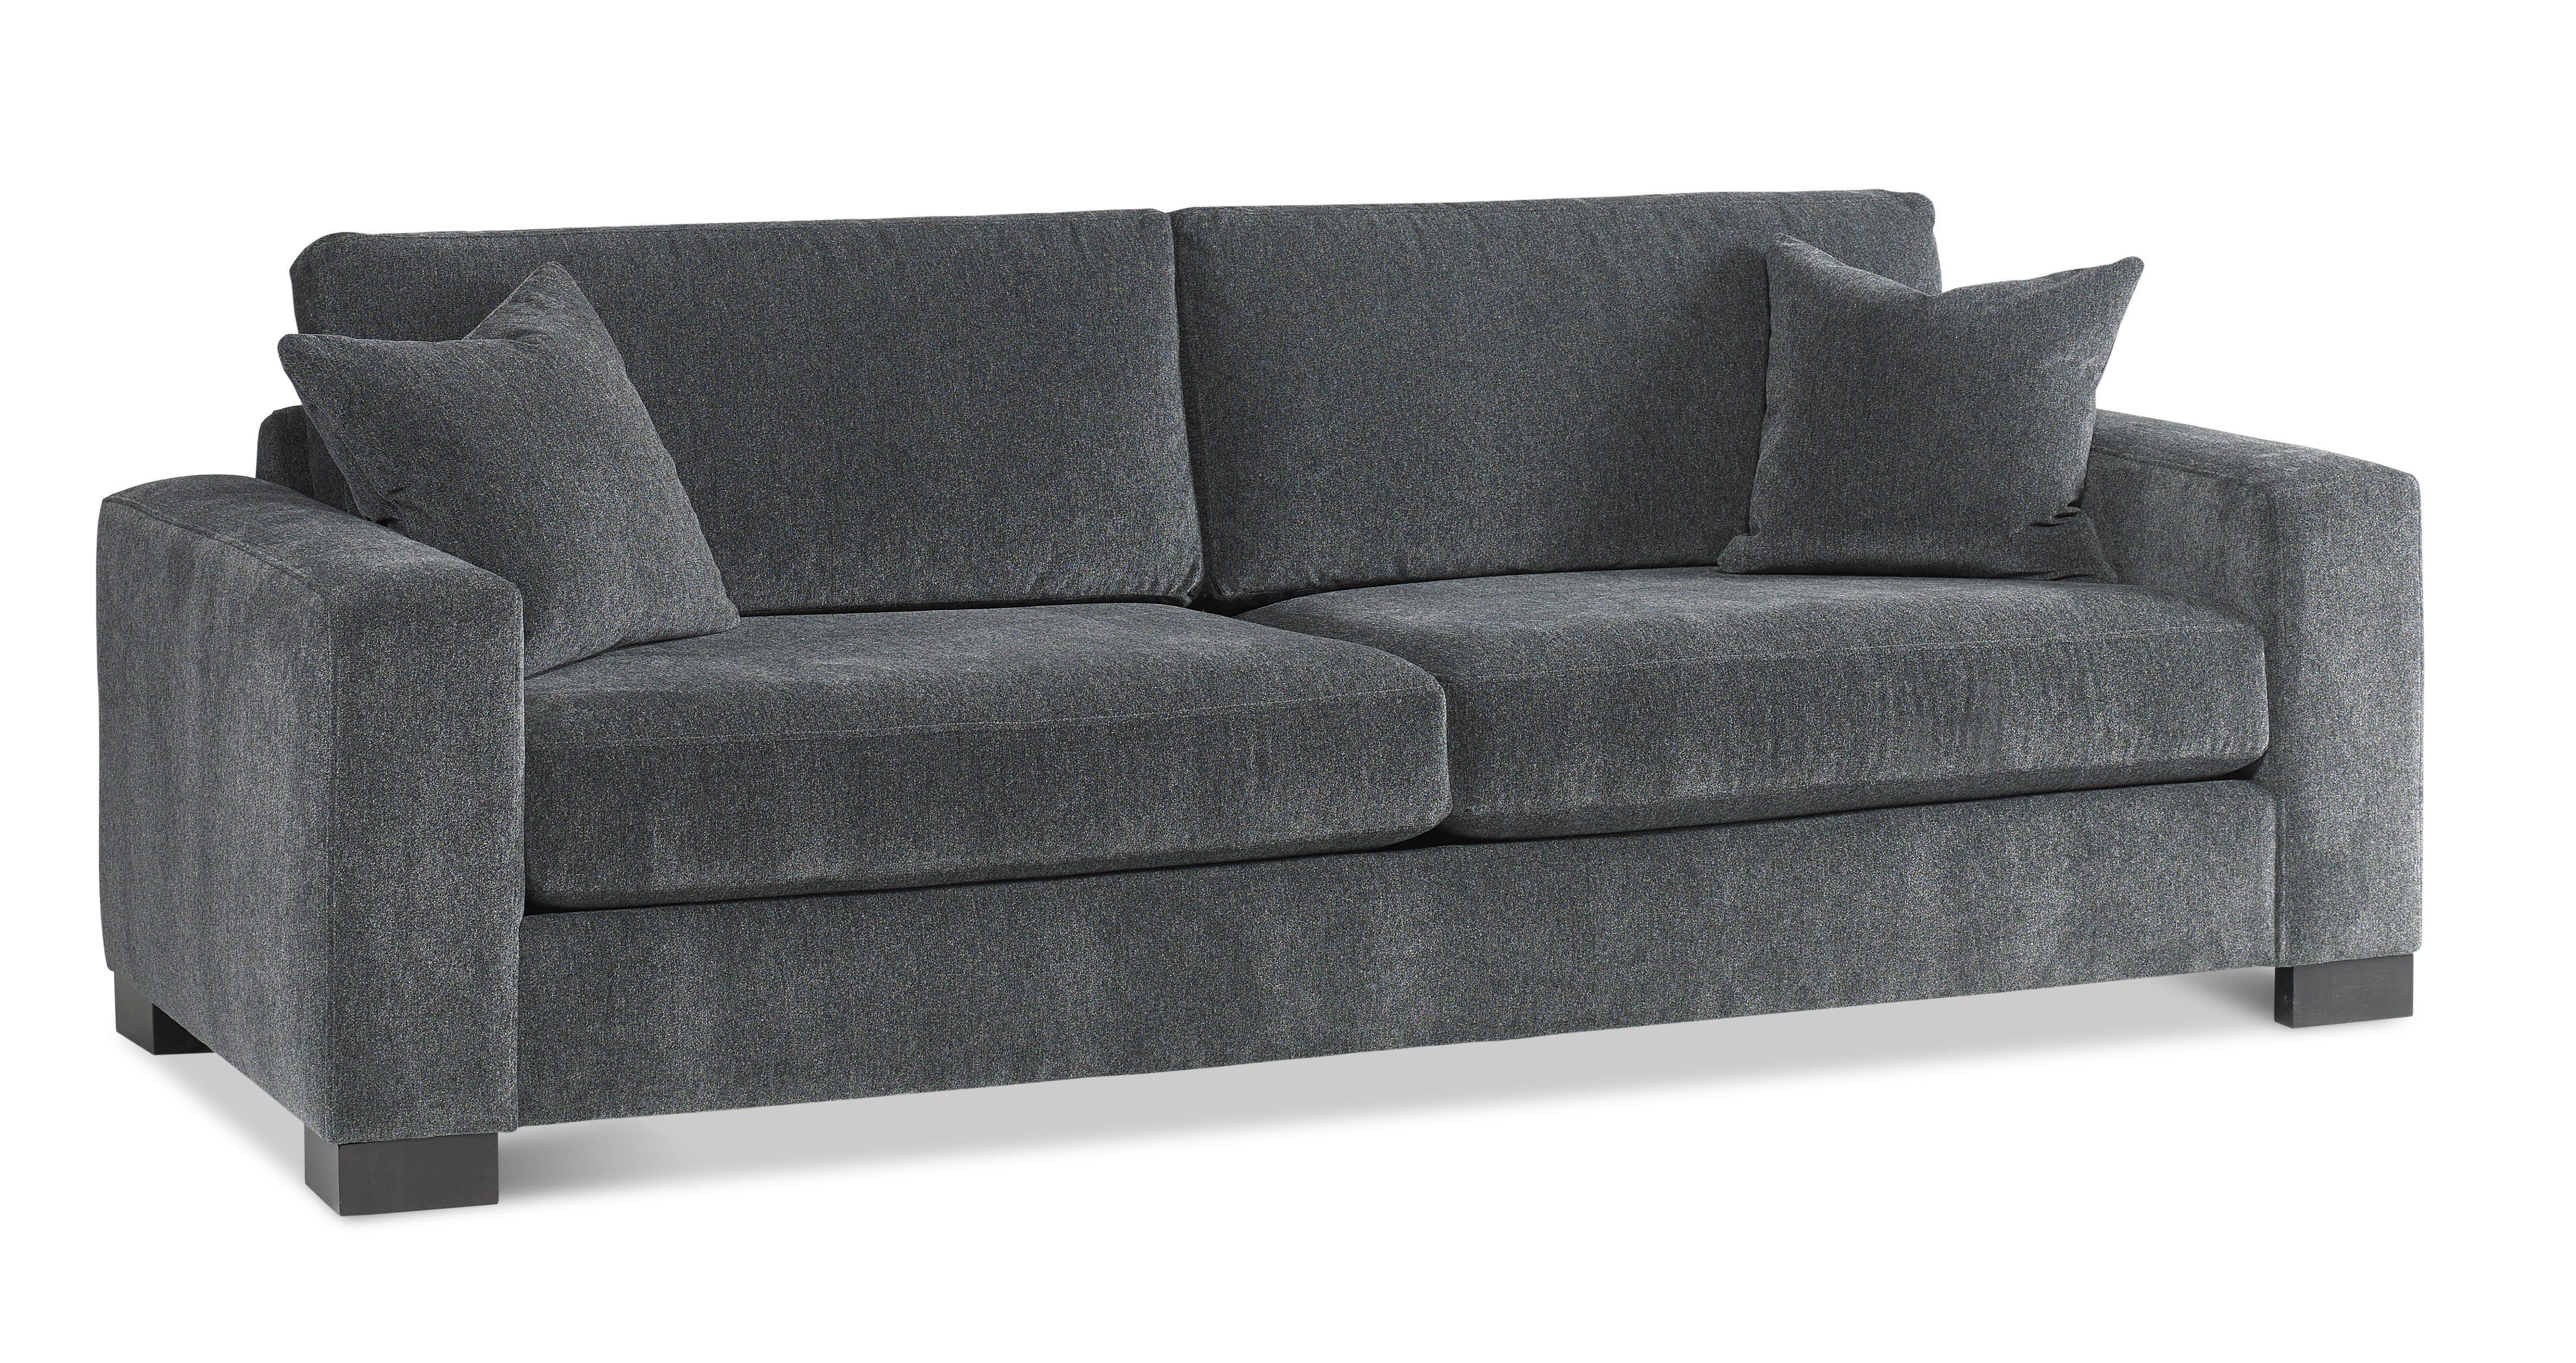 2668-S2 Marshall Sofa